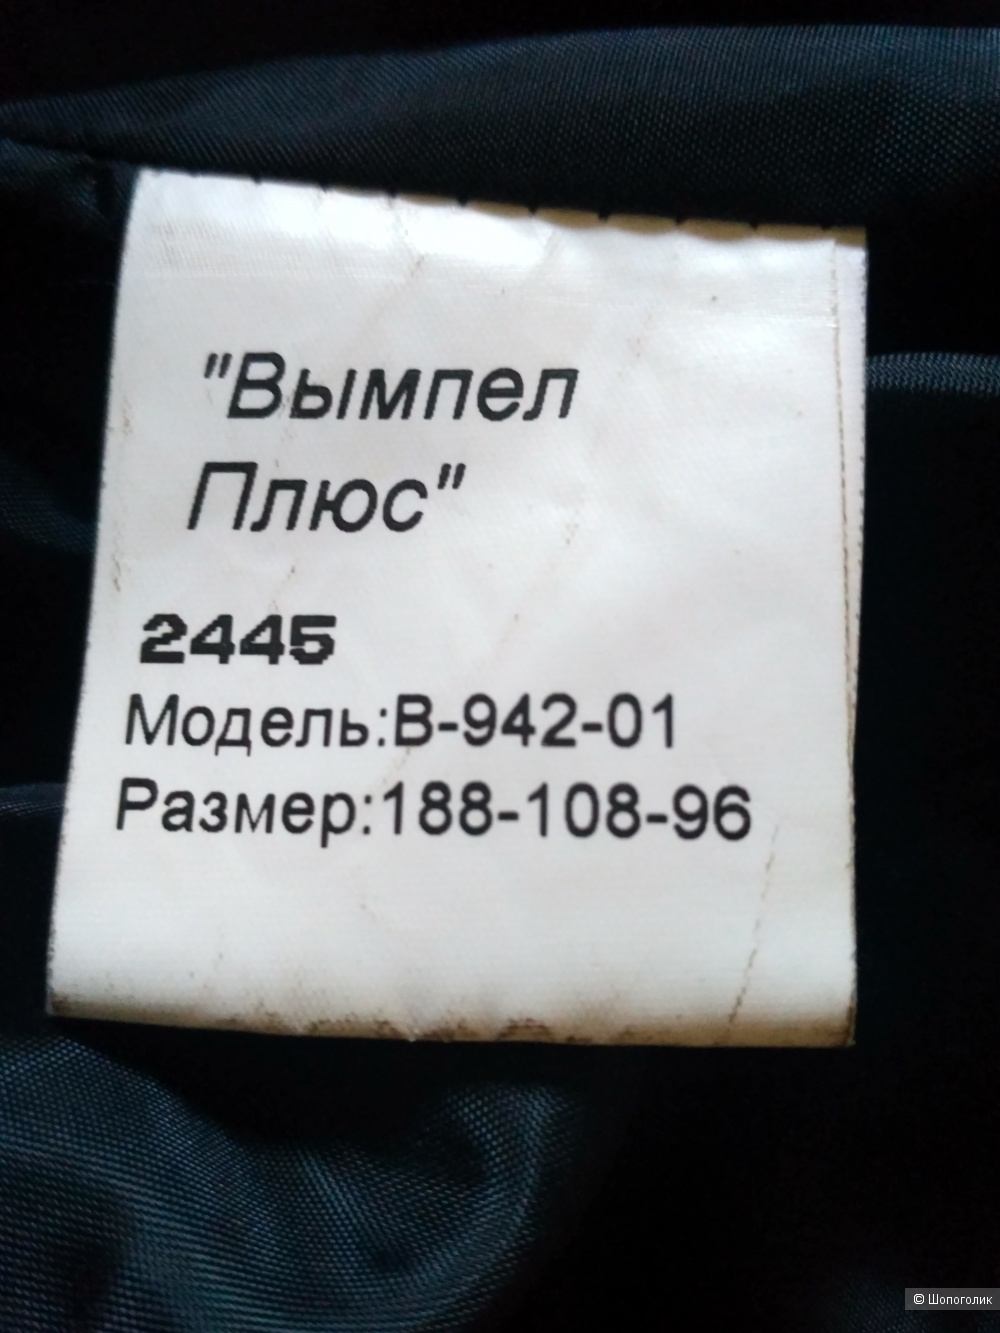 Пальто мужское 54 размер ШО ВЫМПЕЛ